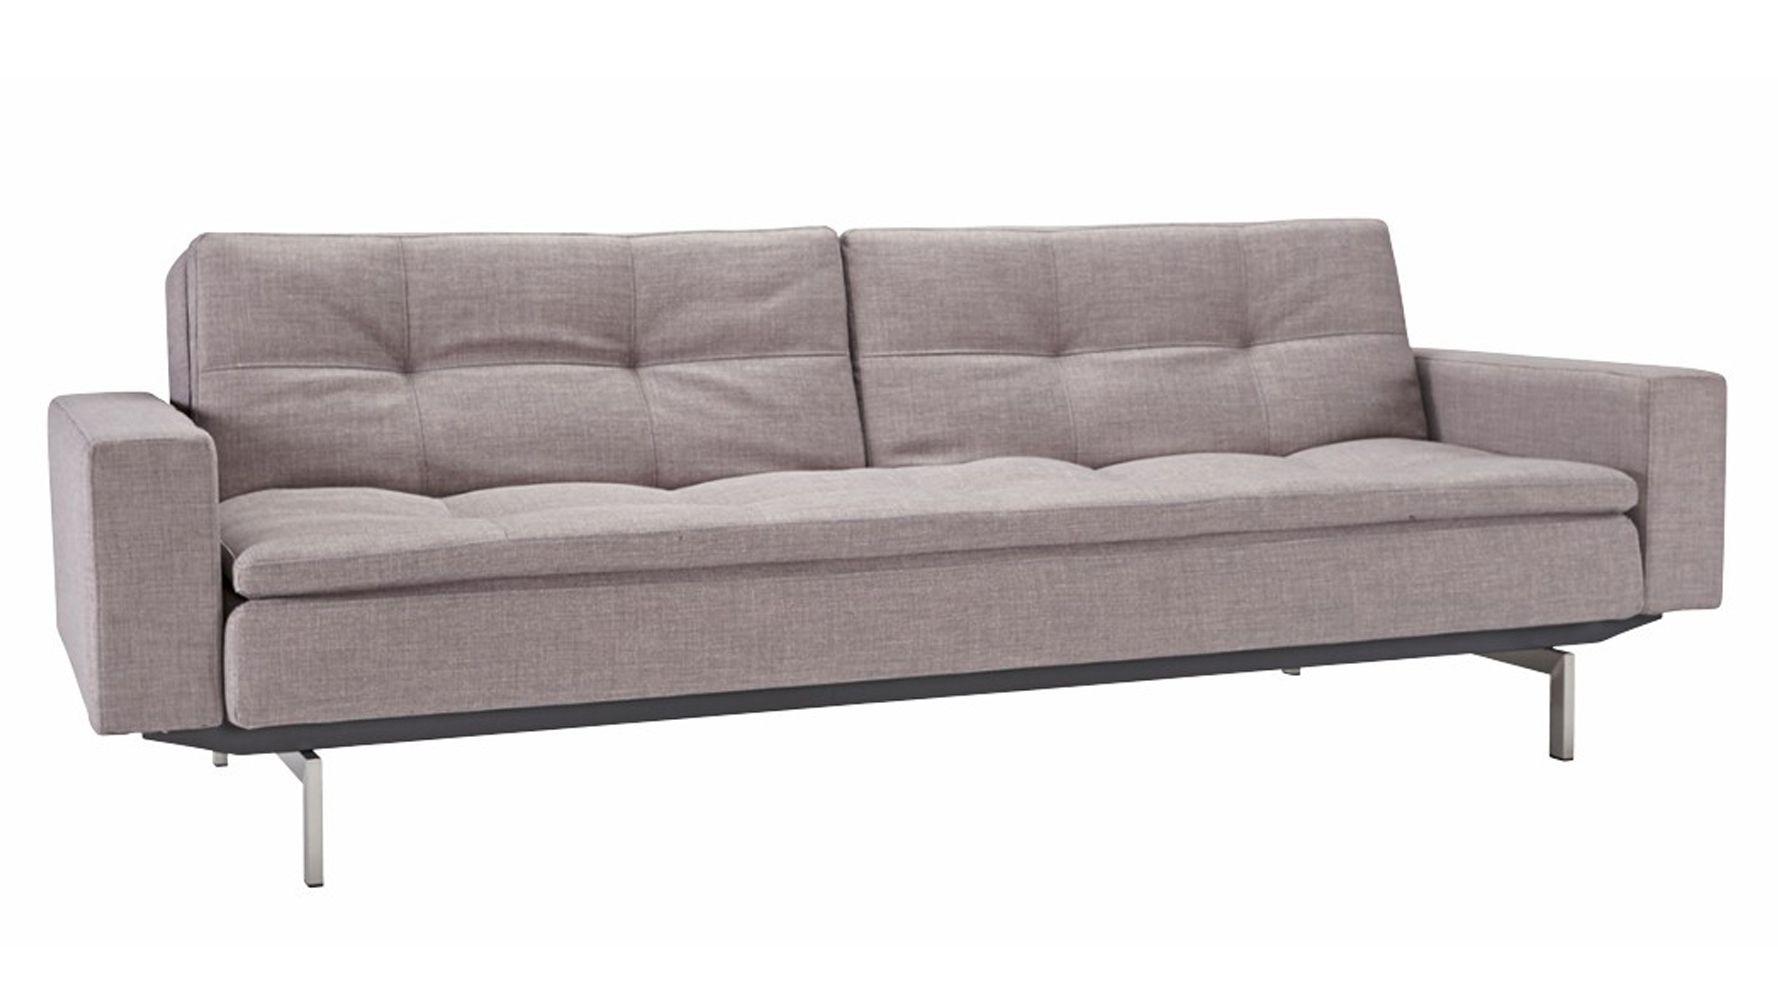 Metroplex Stainless Steel Sofa With Arms Modern Sleeper Sofa